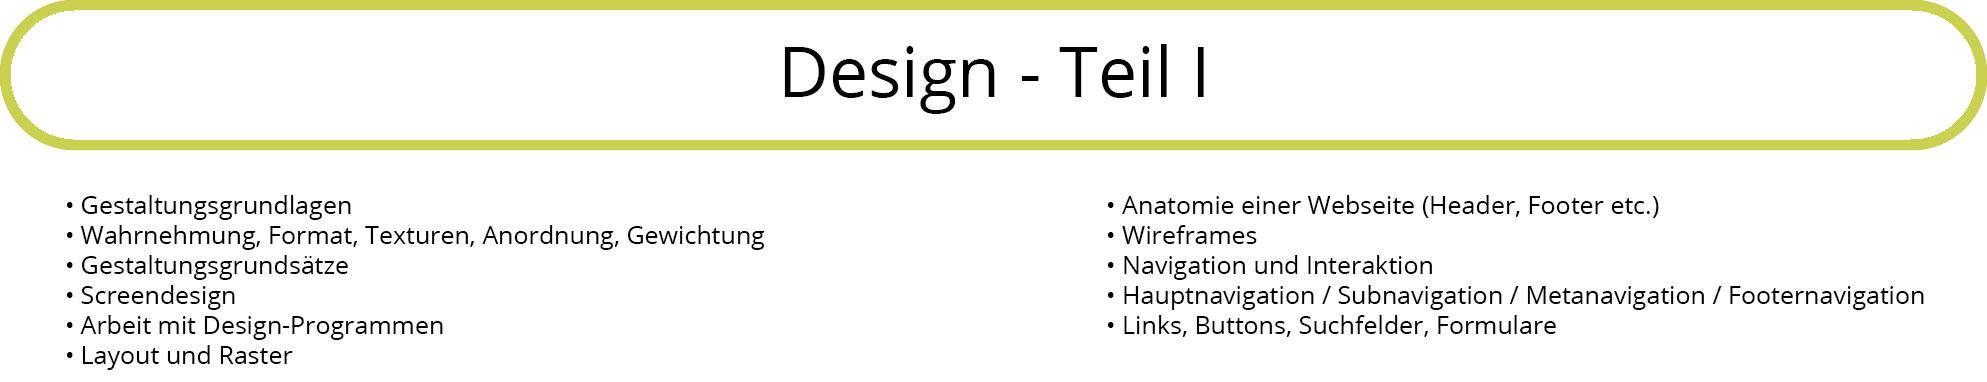 Webdesigner_Kurs_Ausbildung_Webseiten_Design_Agentur_13